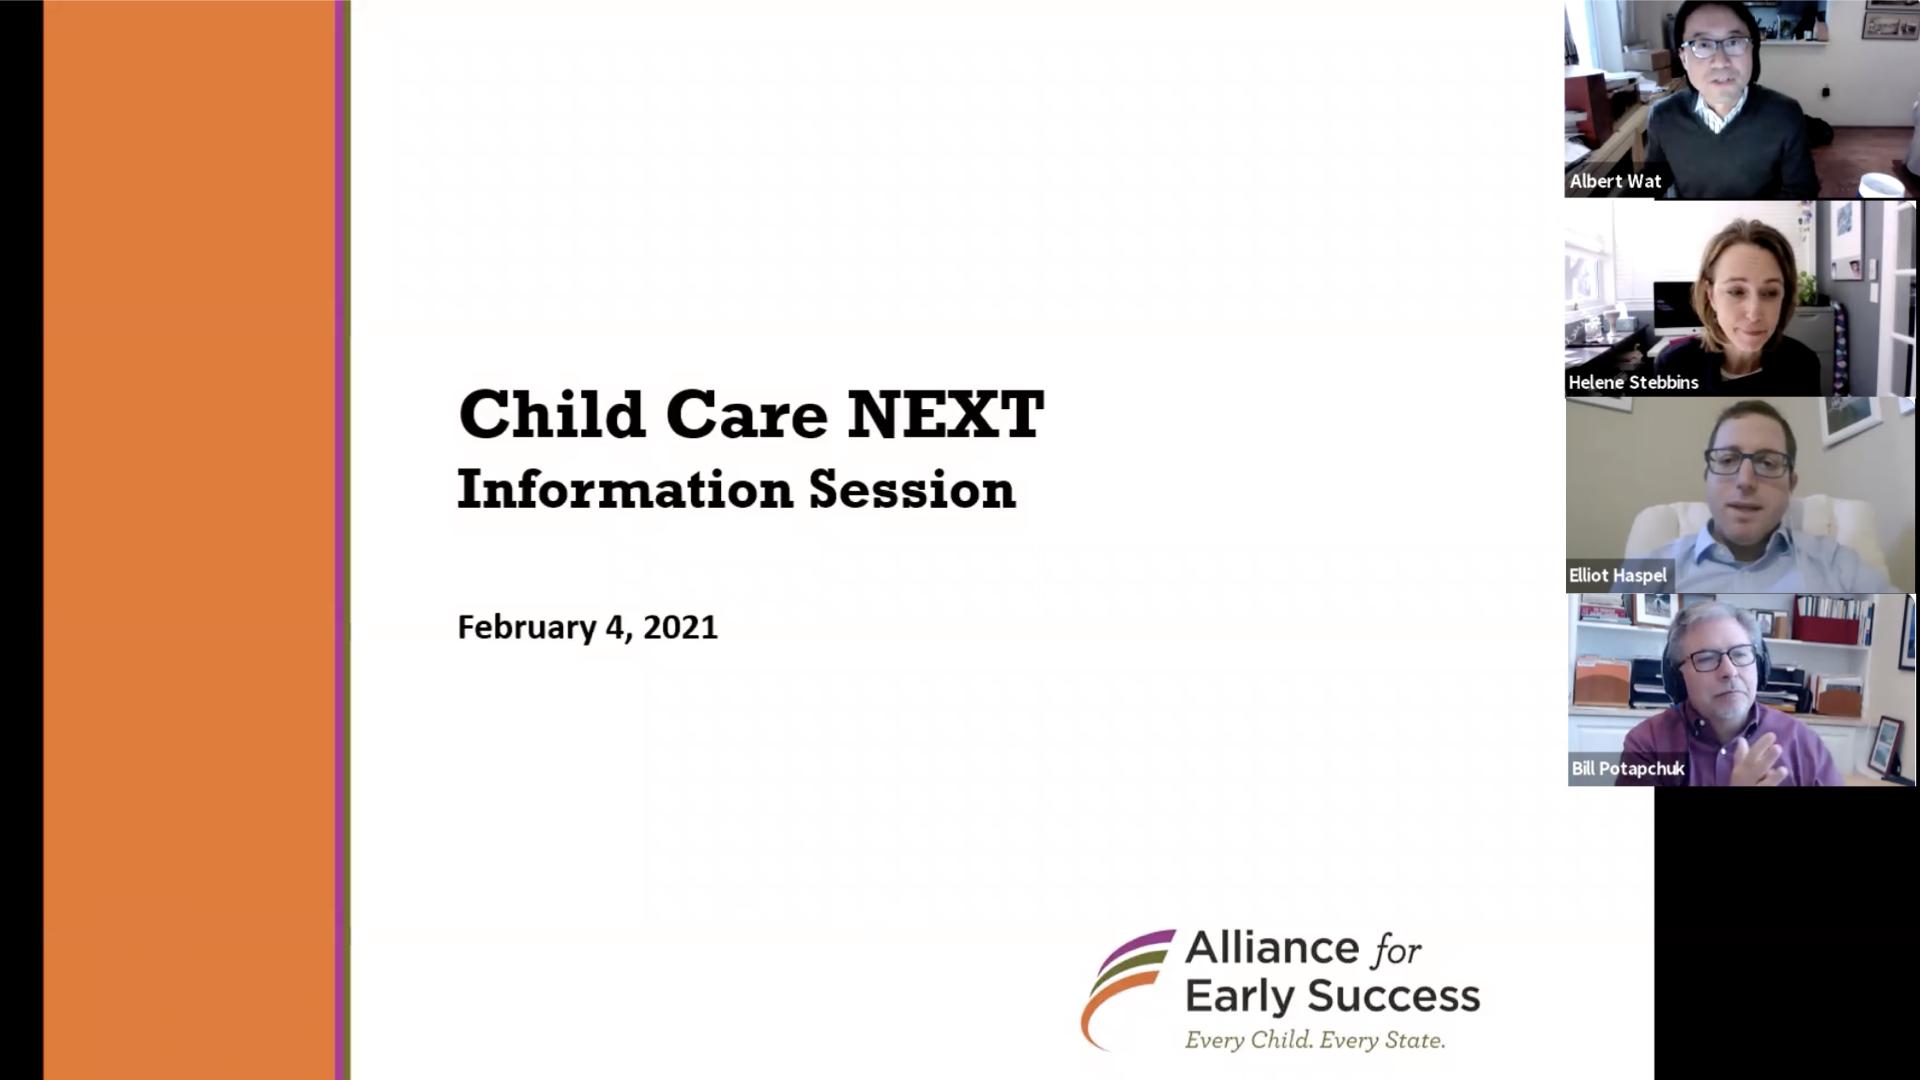 Child Care NEXT Intro Session